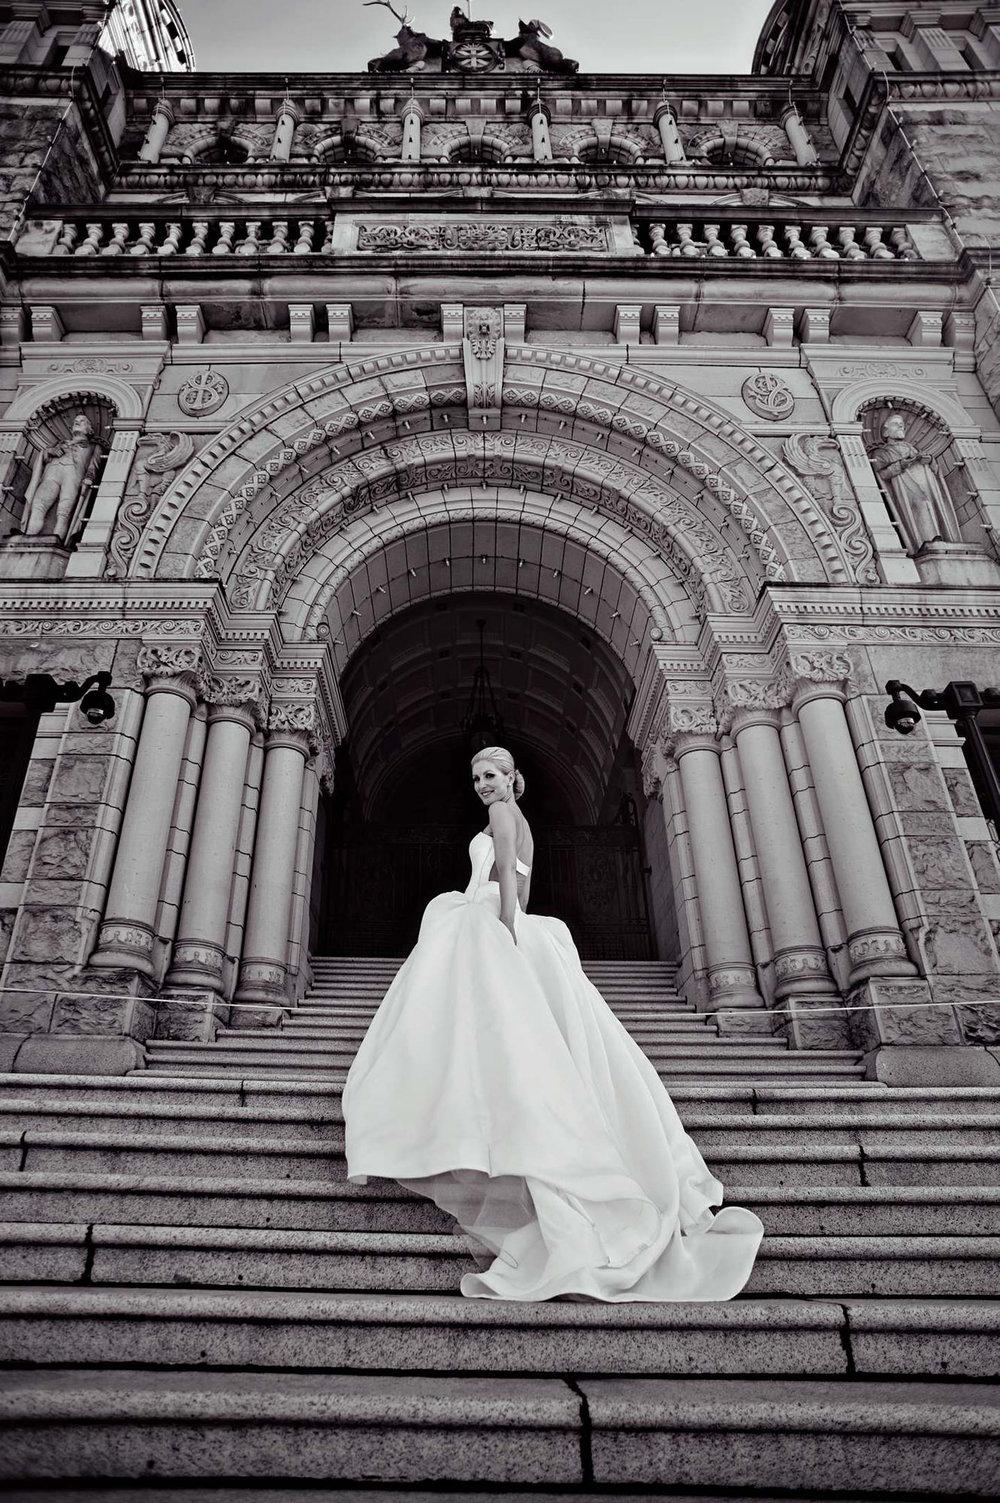 Chris_Hui_婚禮_婚紗照_pre_wedding_photography_best_047_.jpg